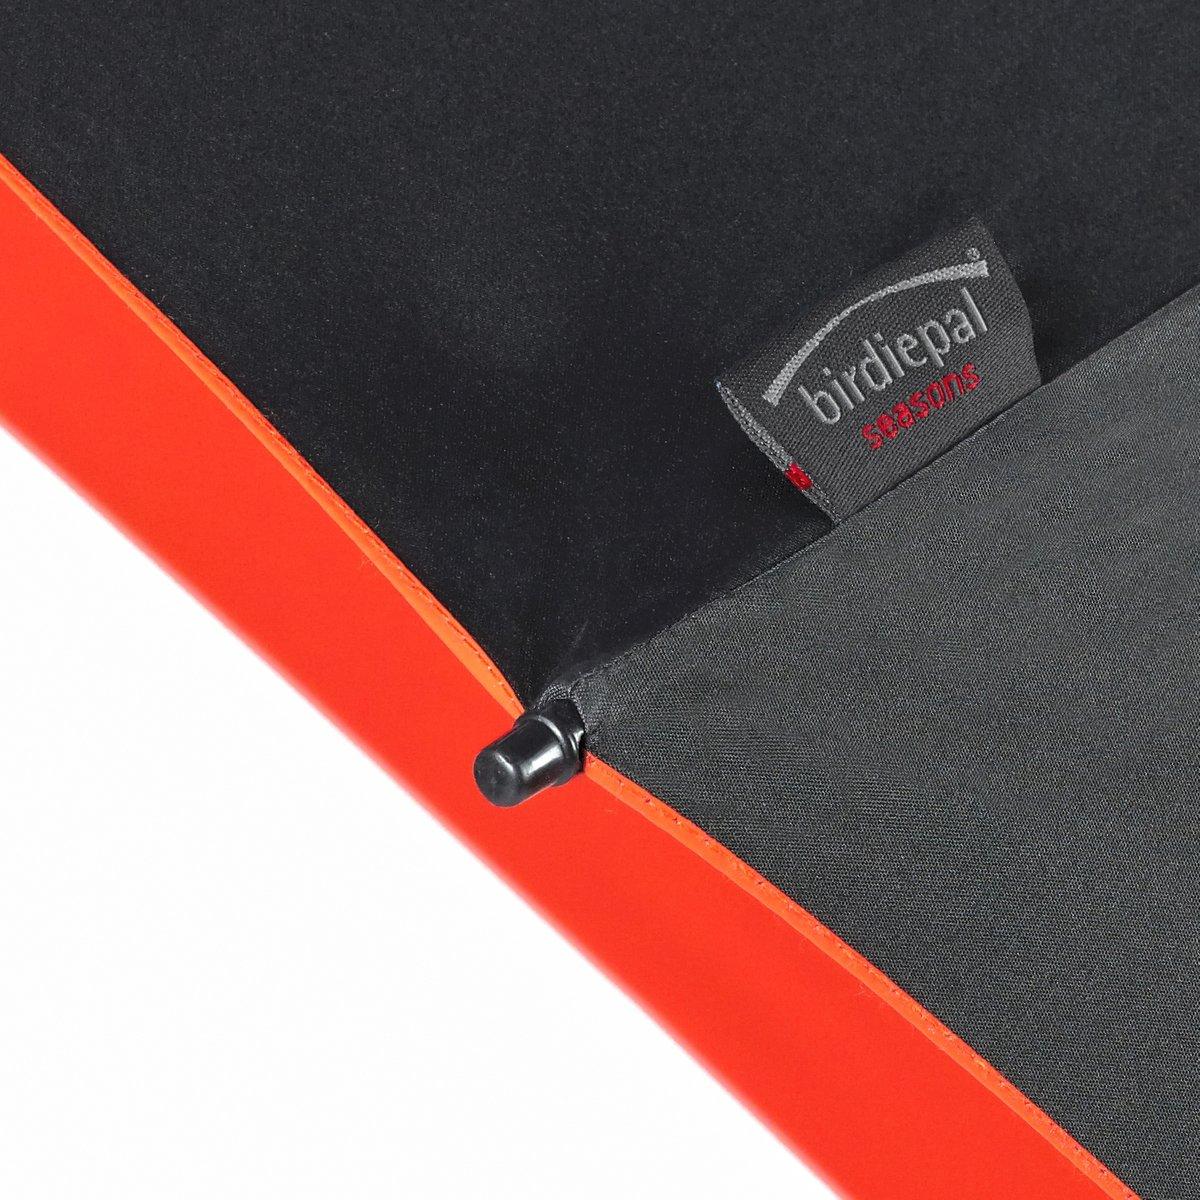 Stockschirm Partnerschirm groß UV-Schutz